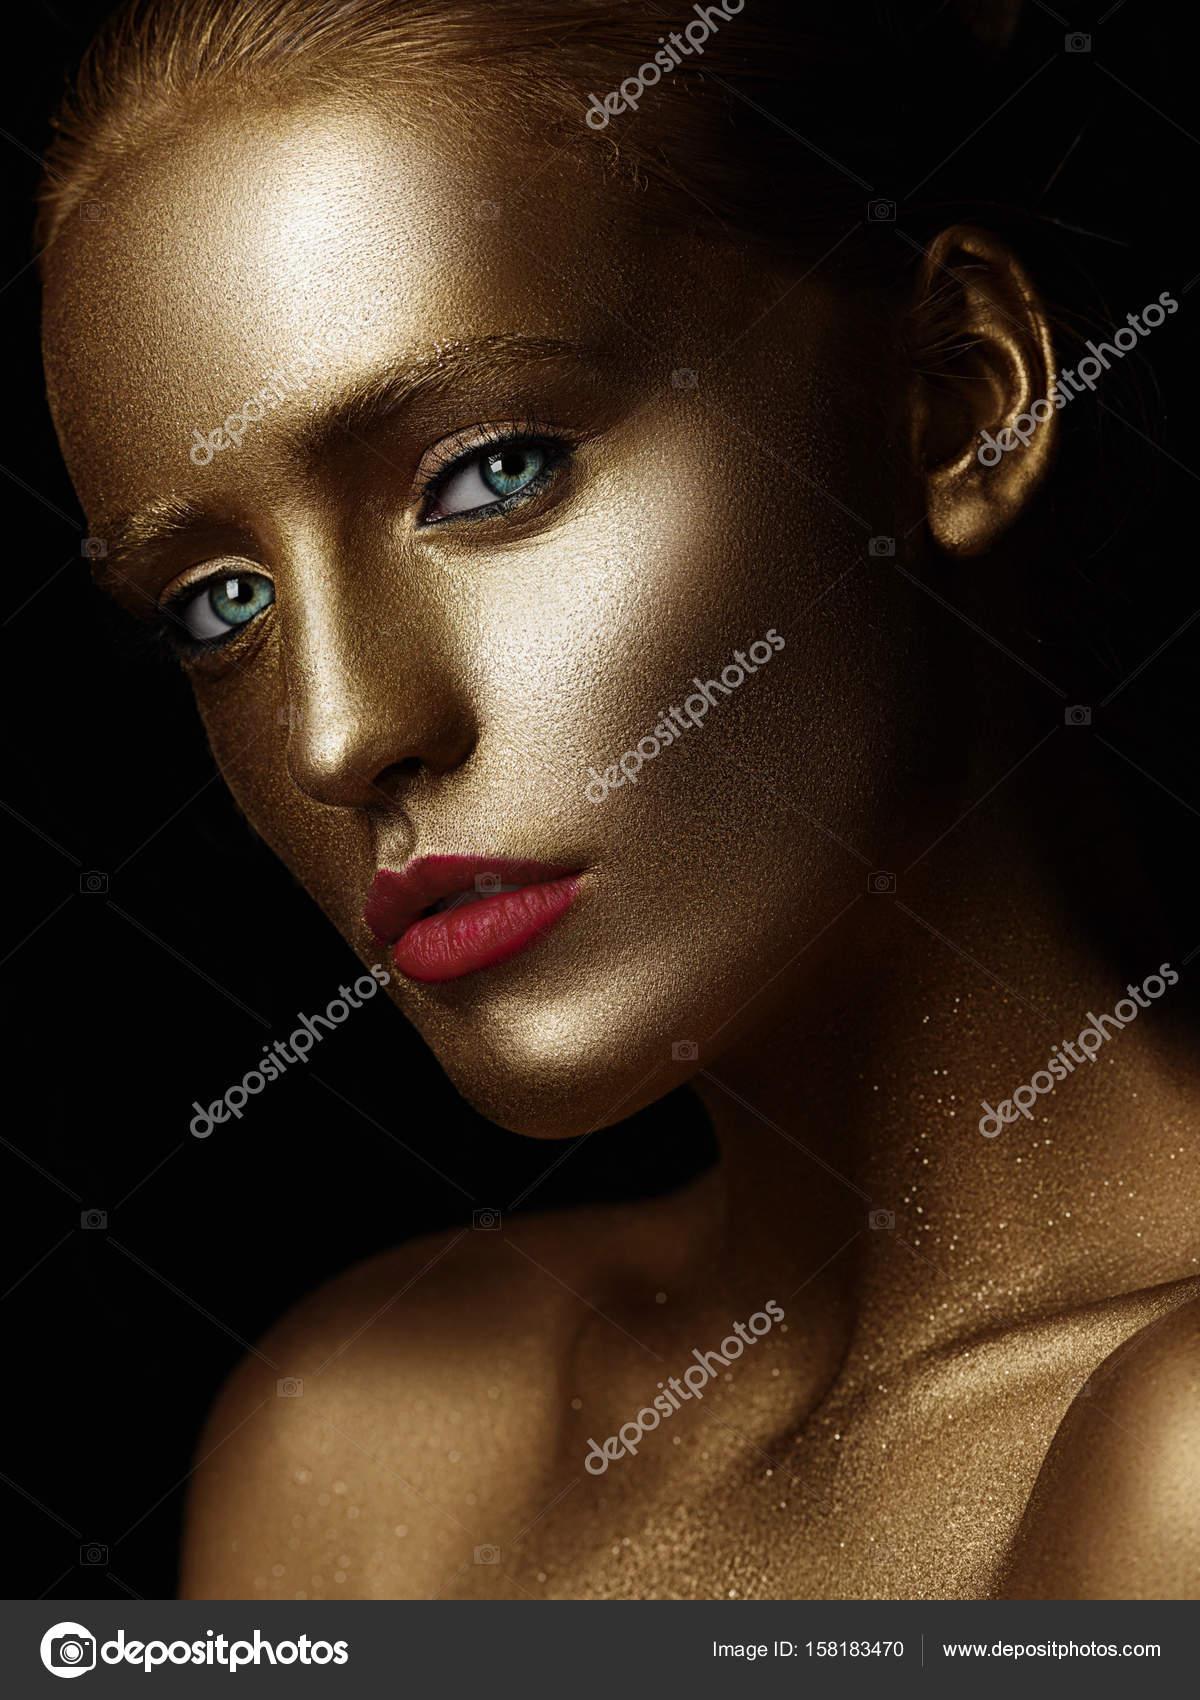 Золотые бодиарт женские тела фото, порно на фоне замка